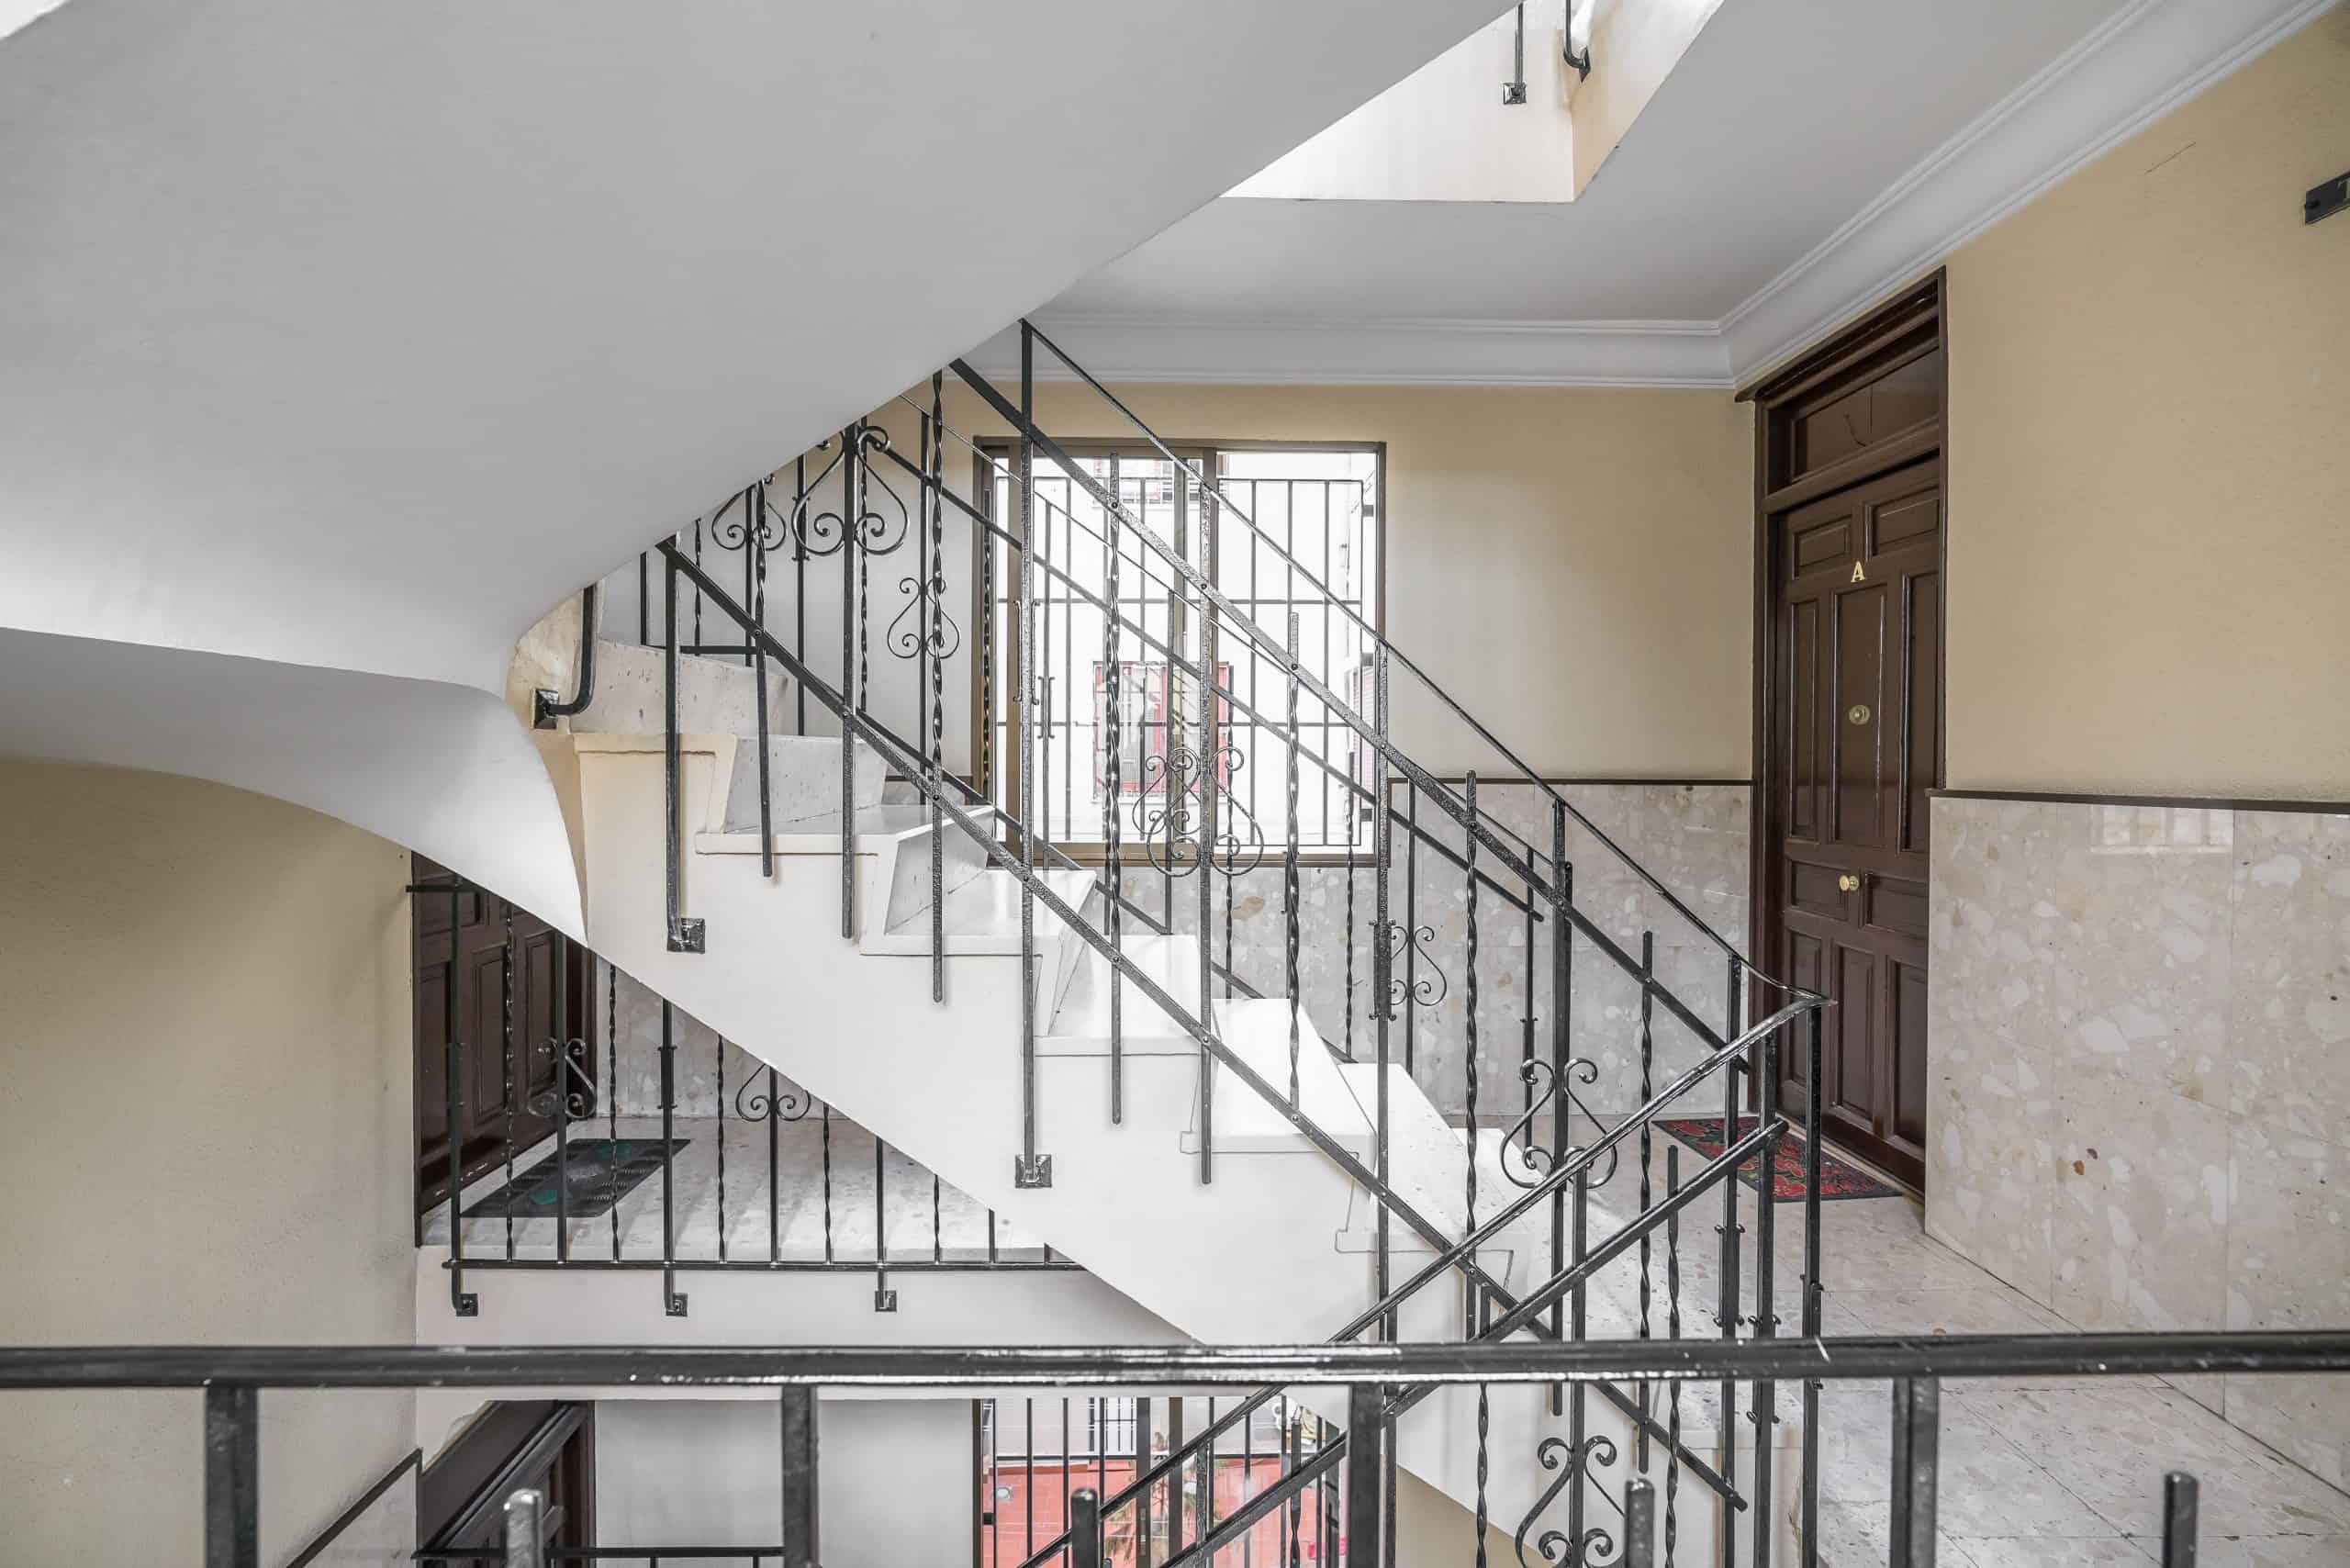 Agencia Inmobiliaria de Madrid-FUTUROCASA-Zona ARGANZUELA-EMBAJADORES-LEGAZPI8 ZONAS COMUNES (2)